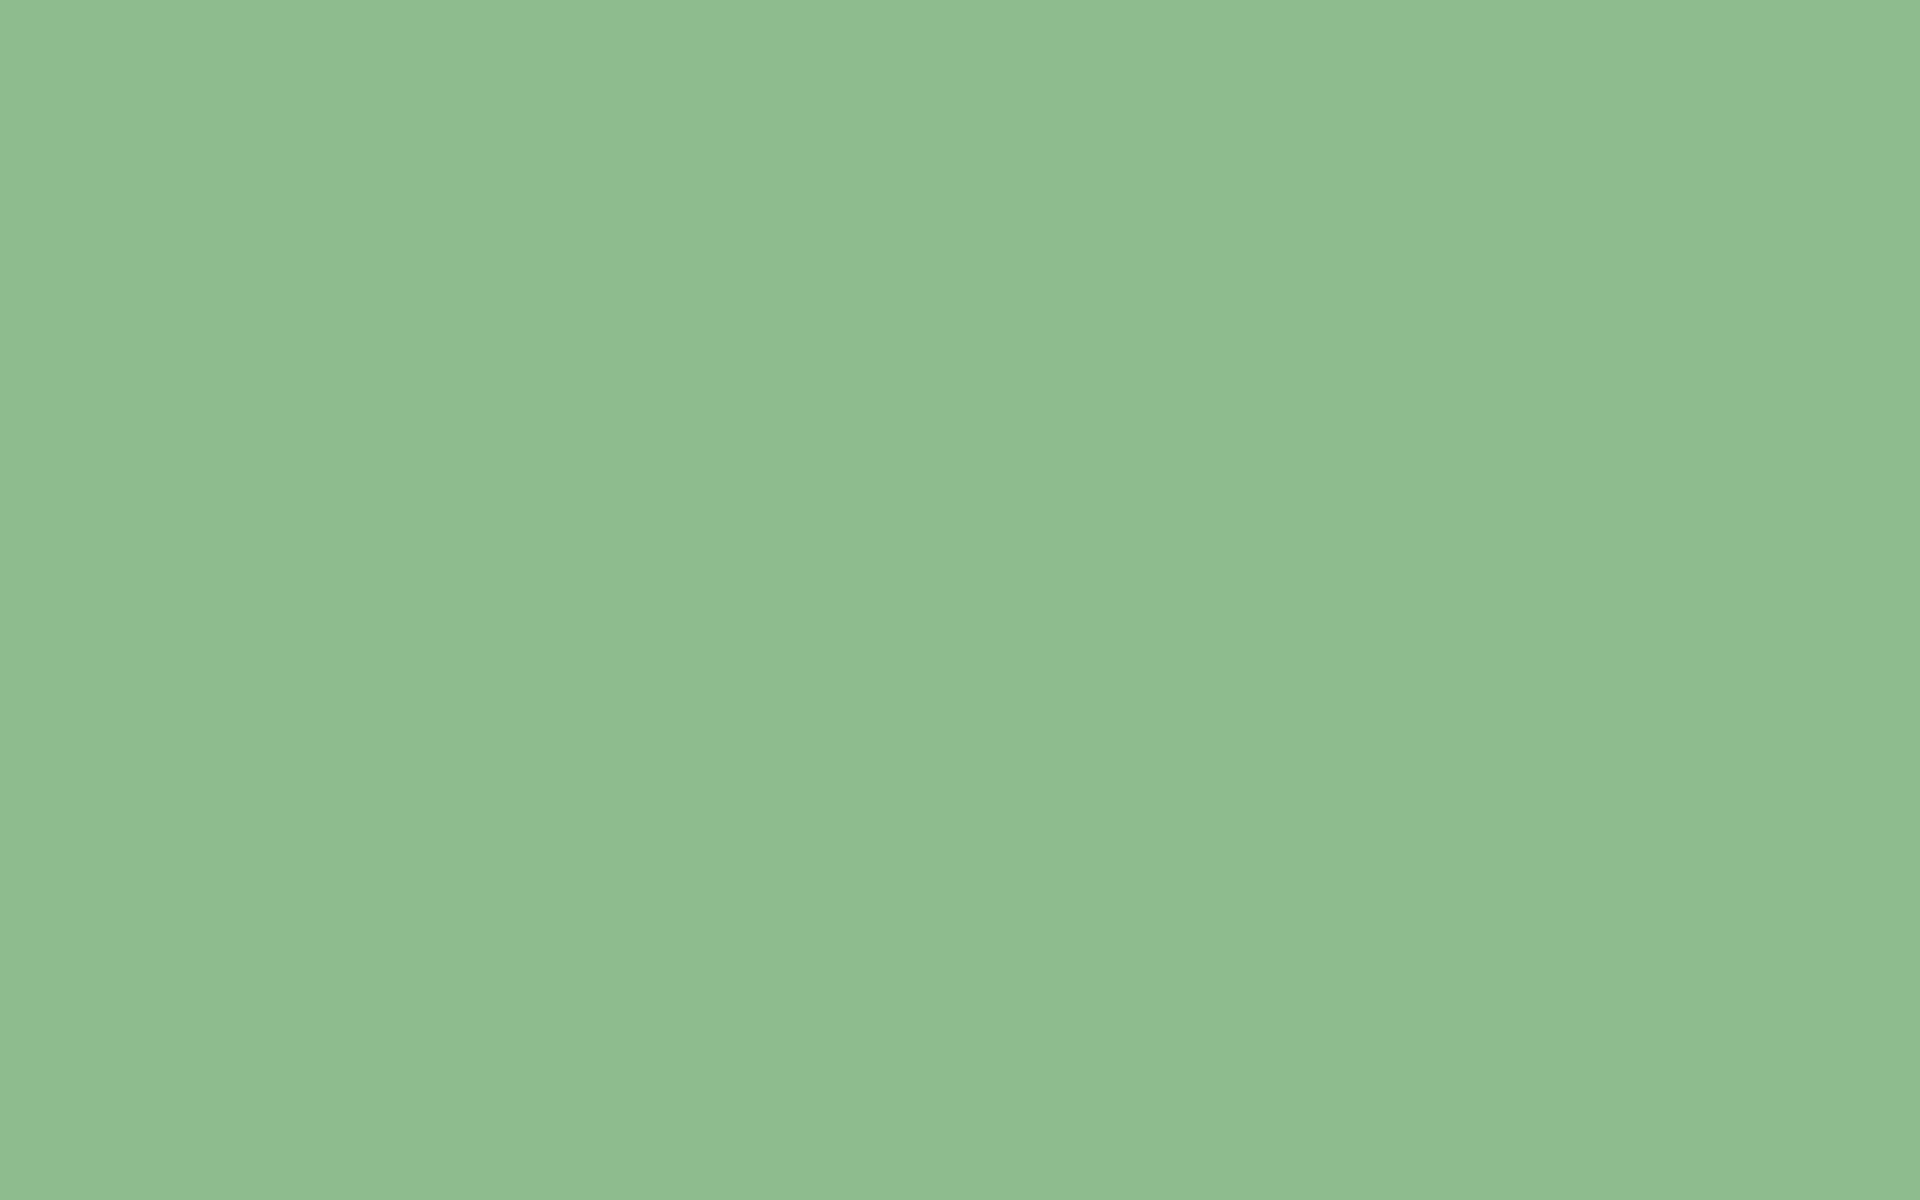 1920x1200 Dark Sea Green Solid Color Background